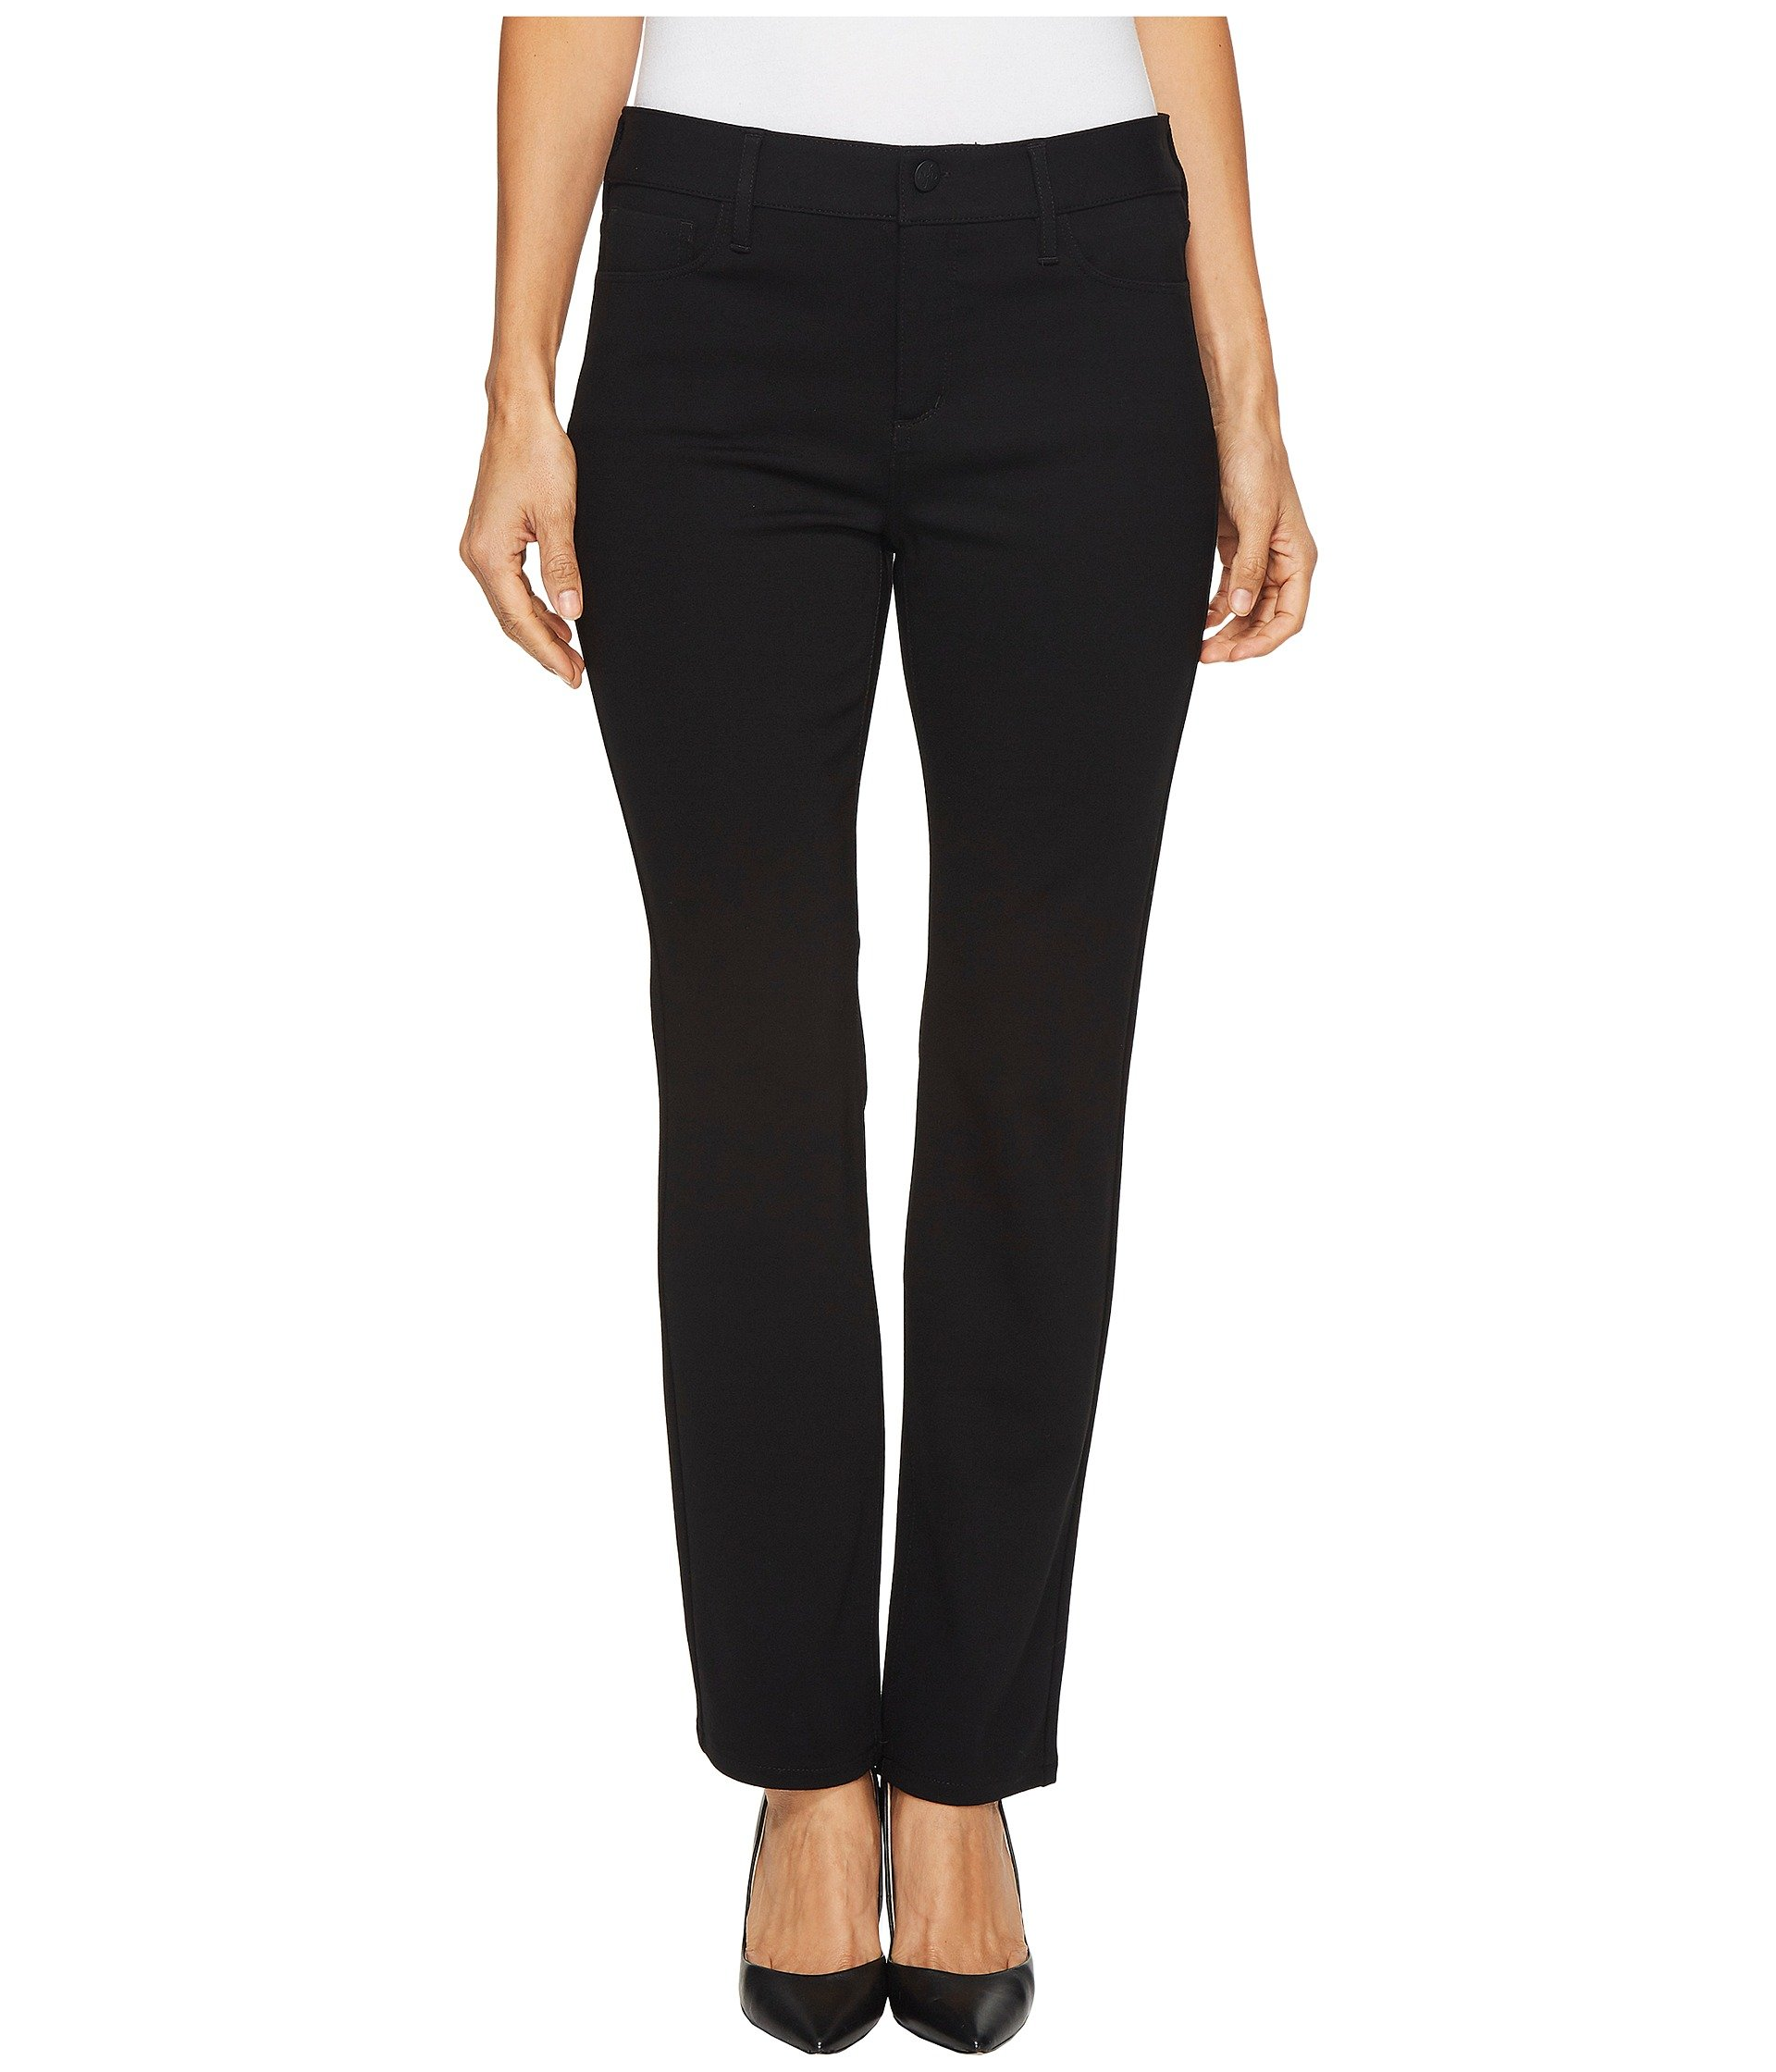 NYDJ Women's Petite Size Sheri Slim Jean, Black, 2P